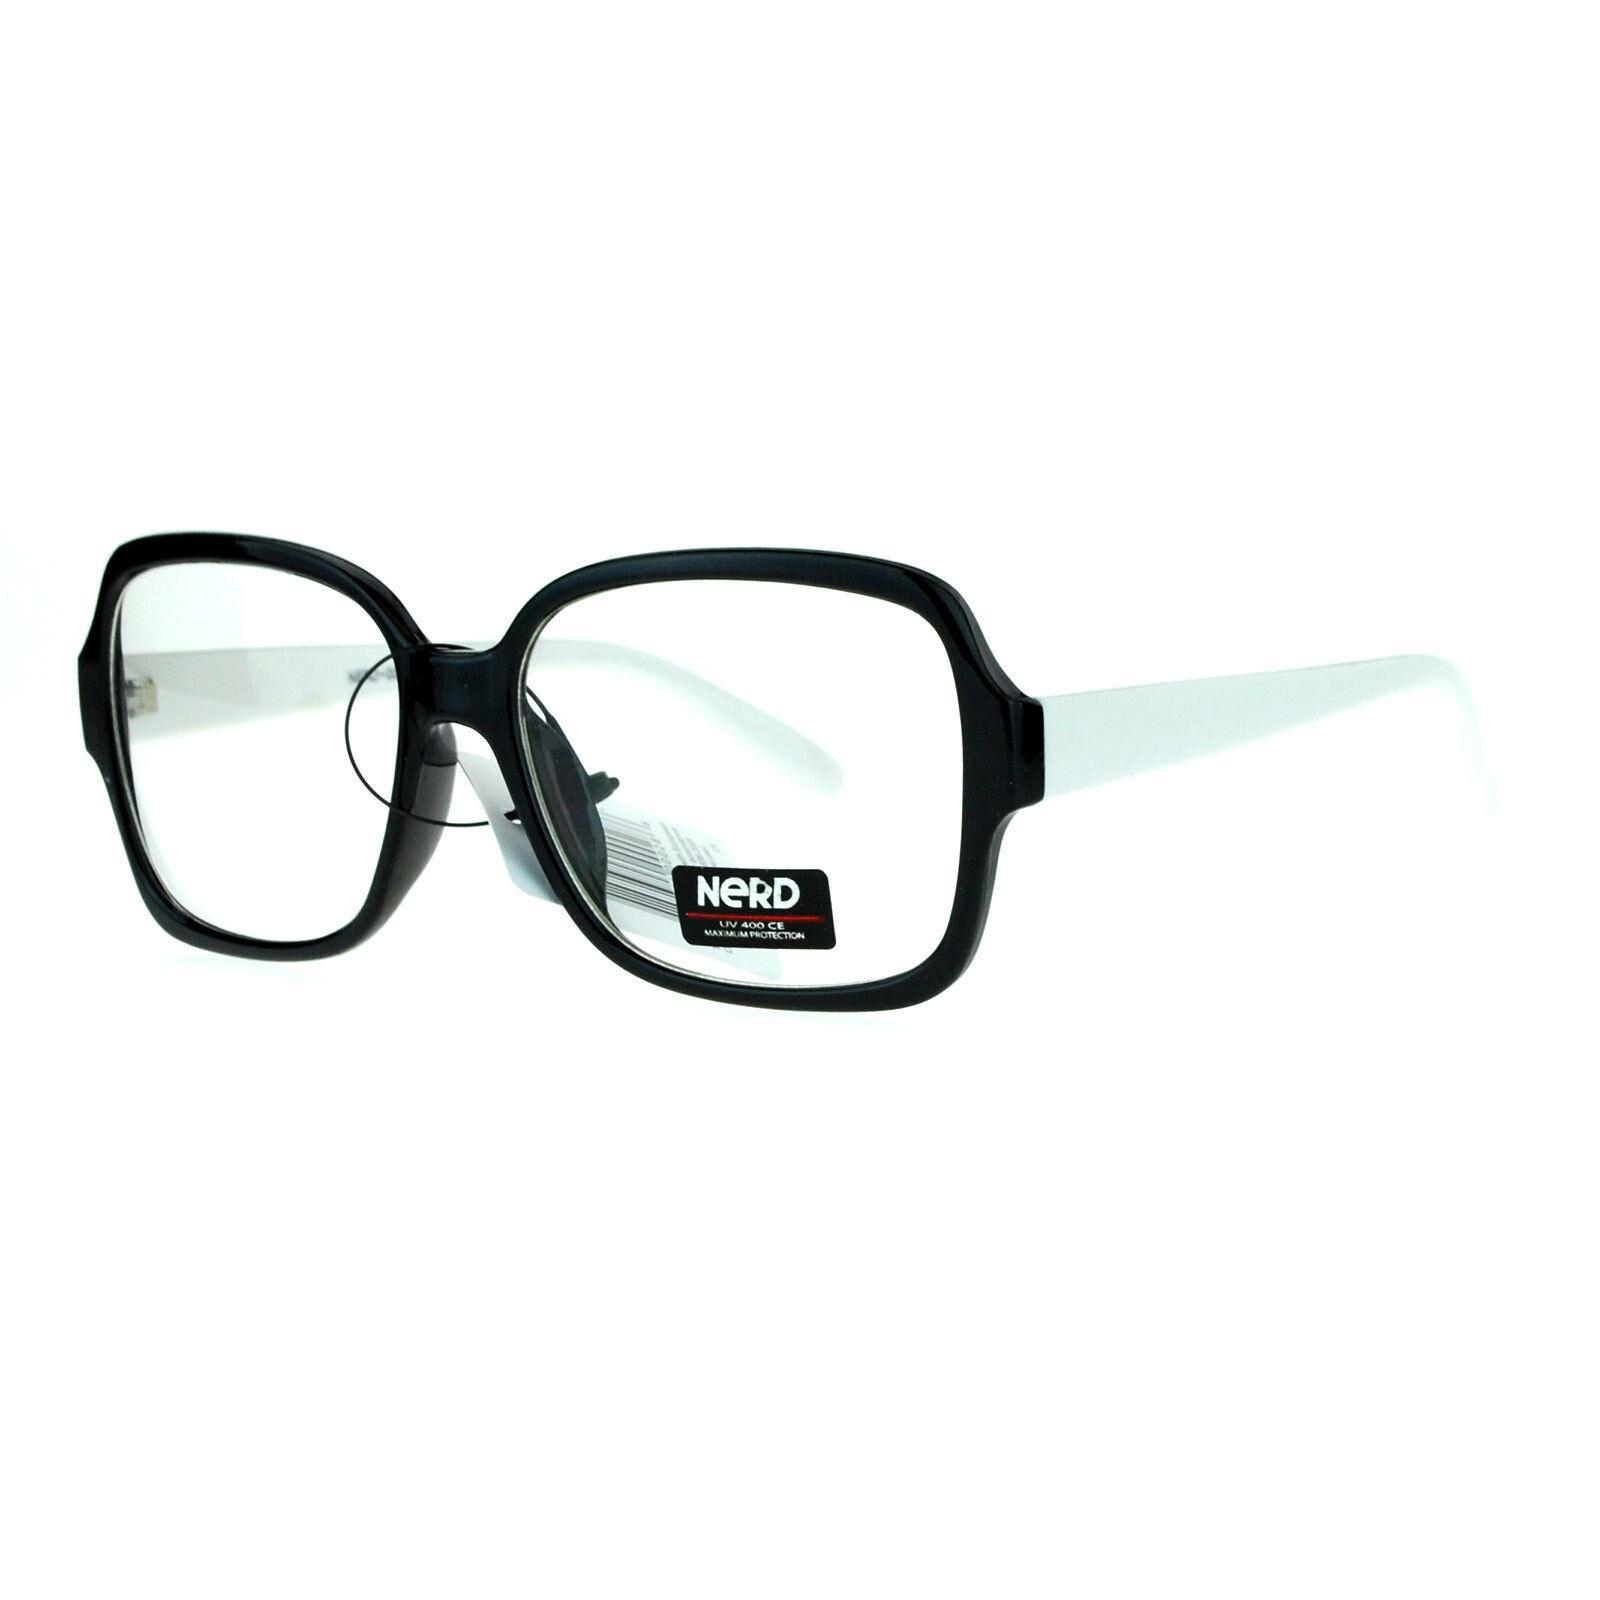 Nerd Eyewear Clear Lens Glasses Square Frame Hipster Fashion Eyeglasses